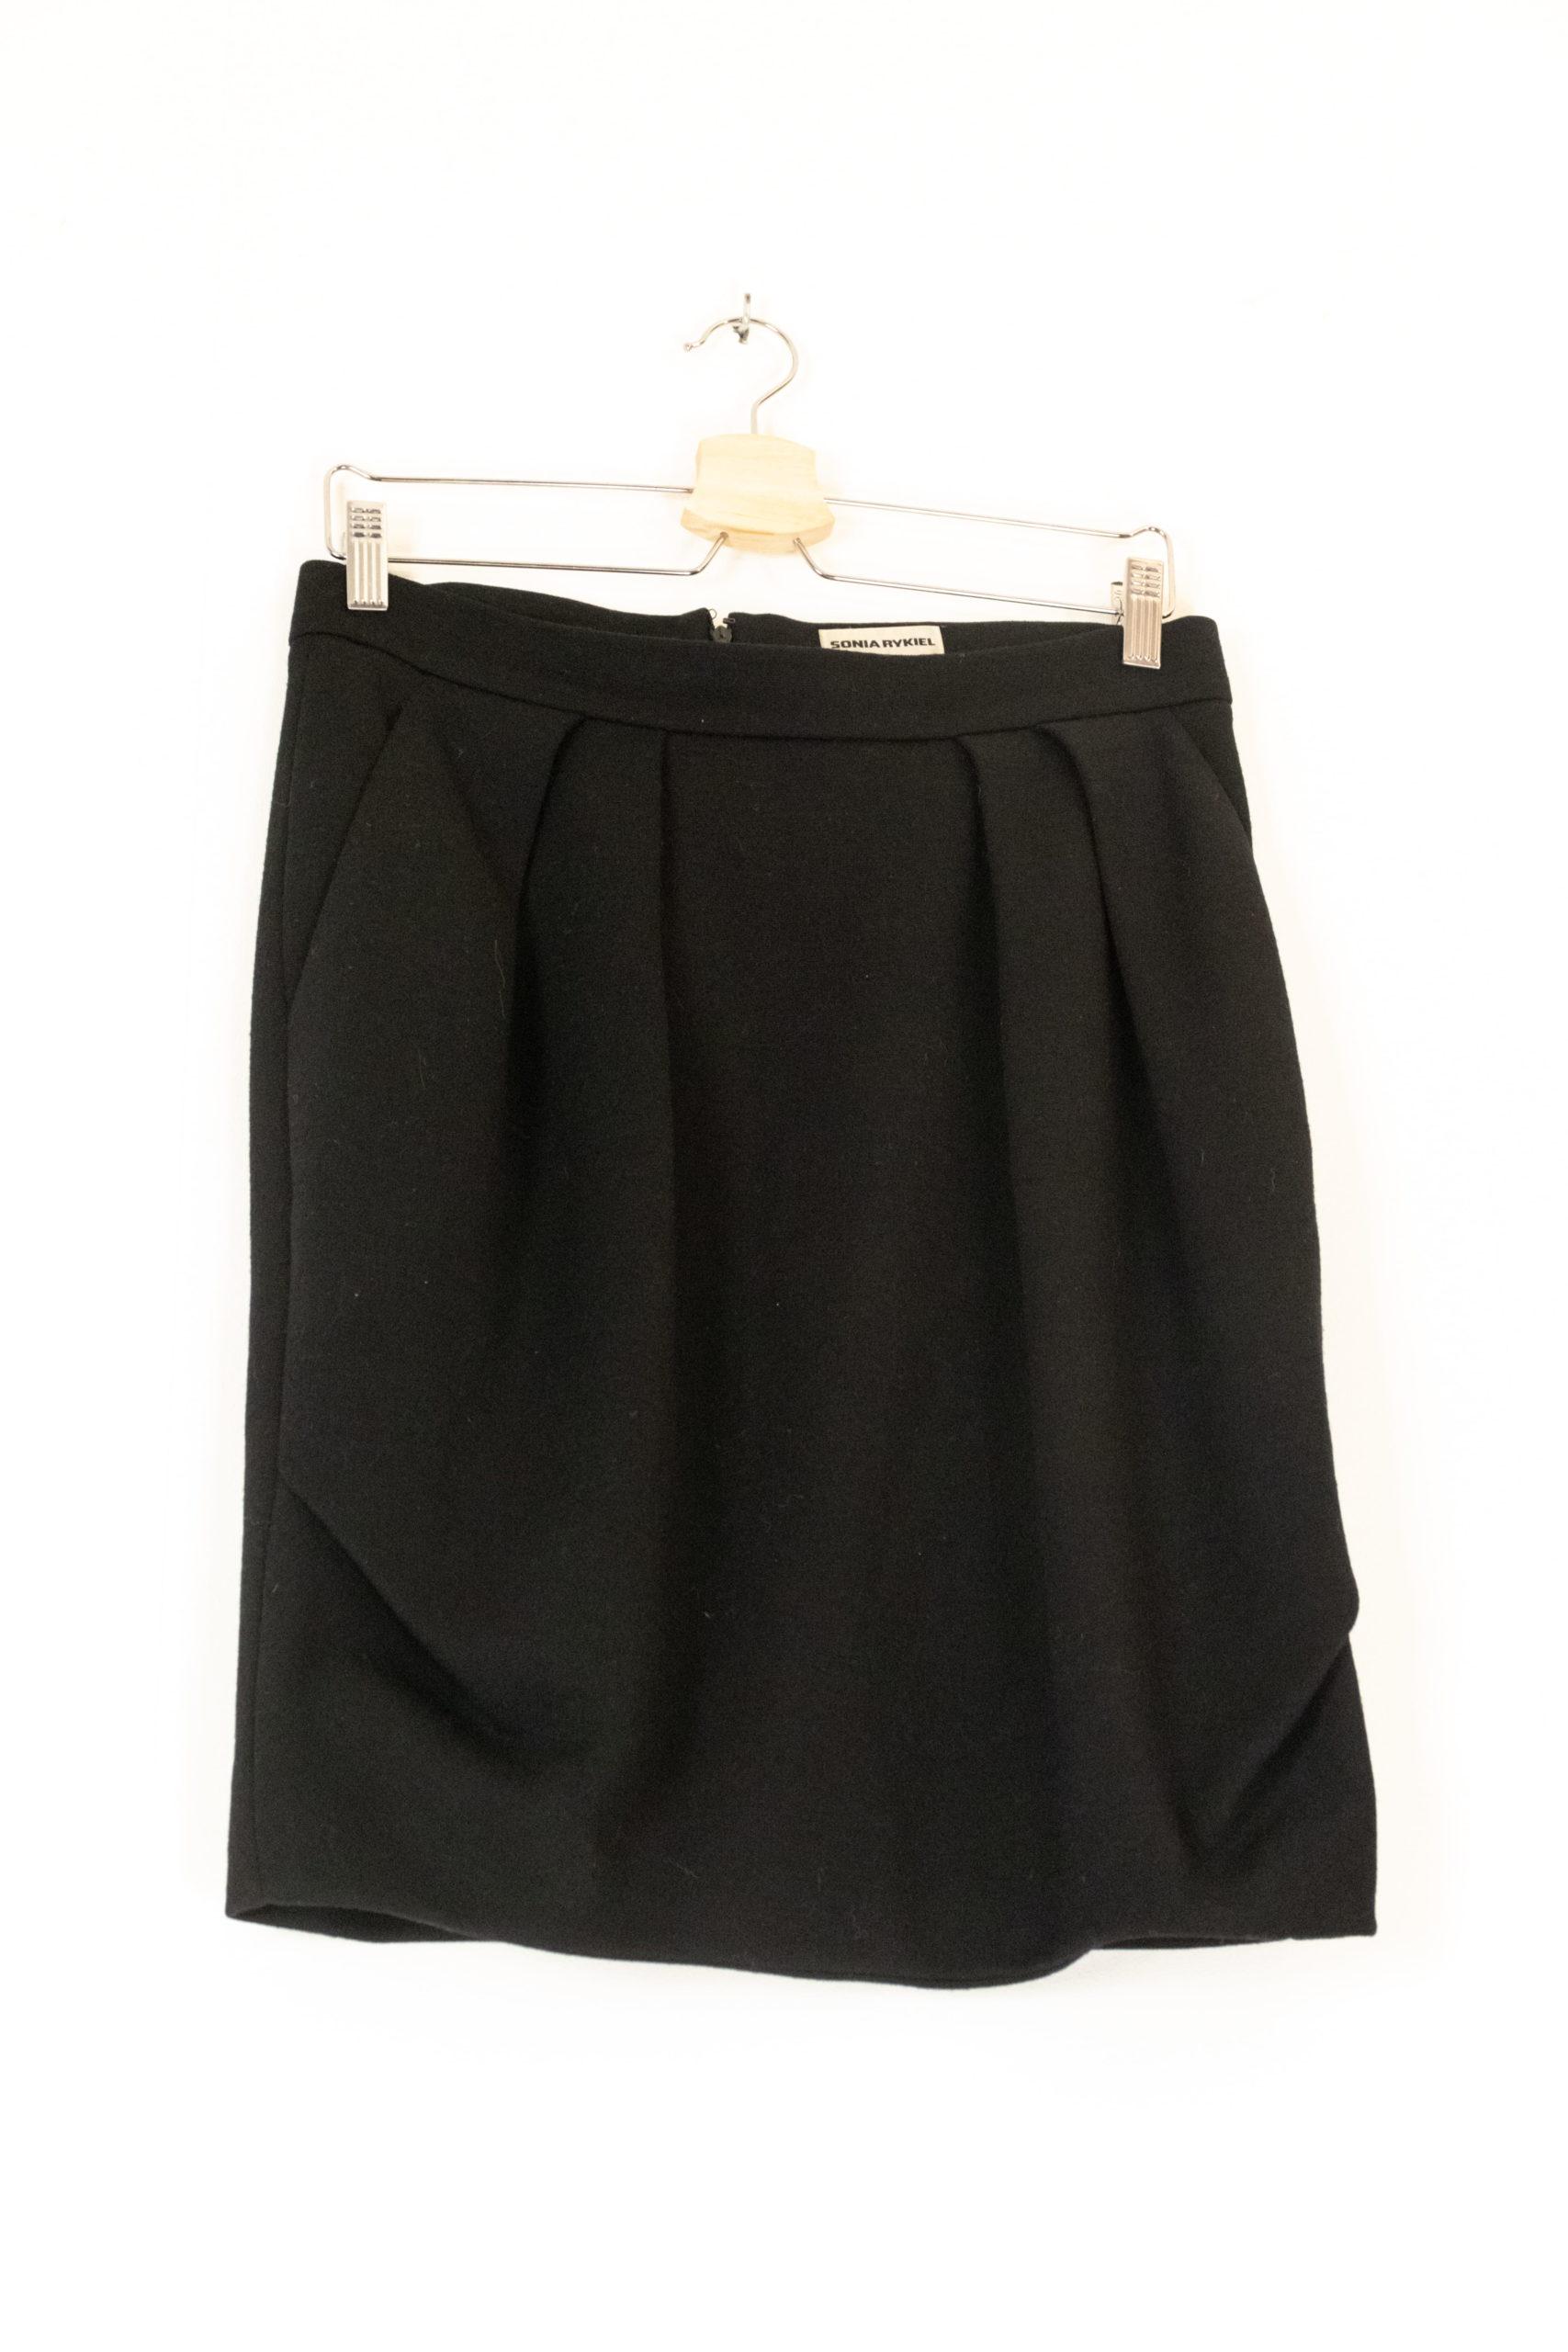 jupe noir sonia rykiel (1)